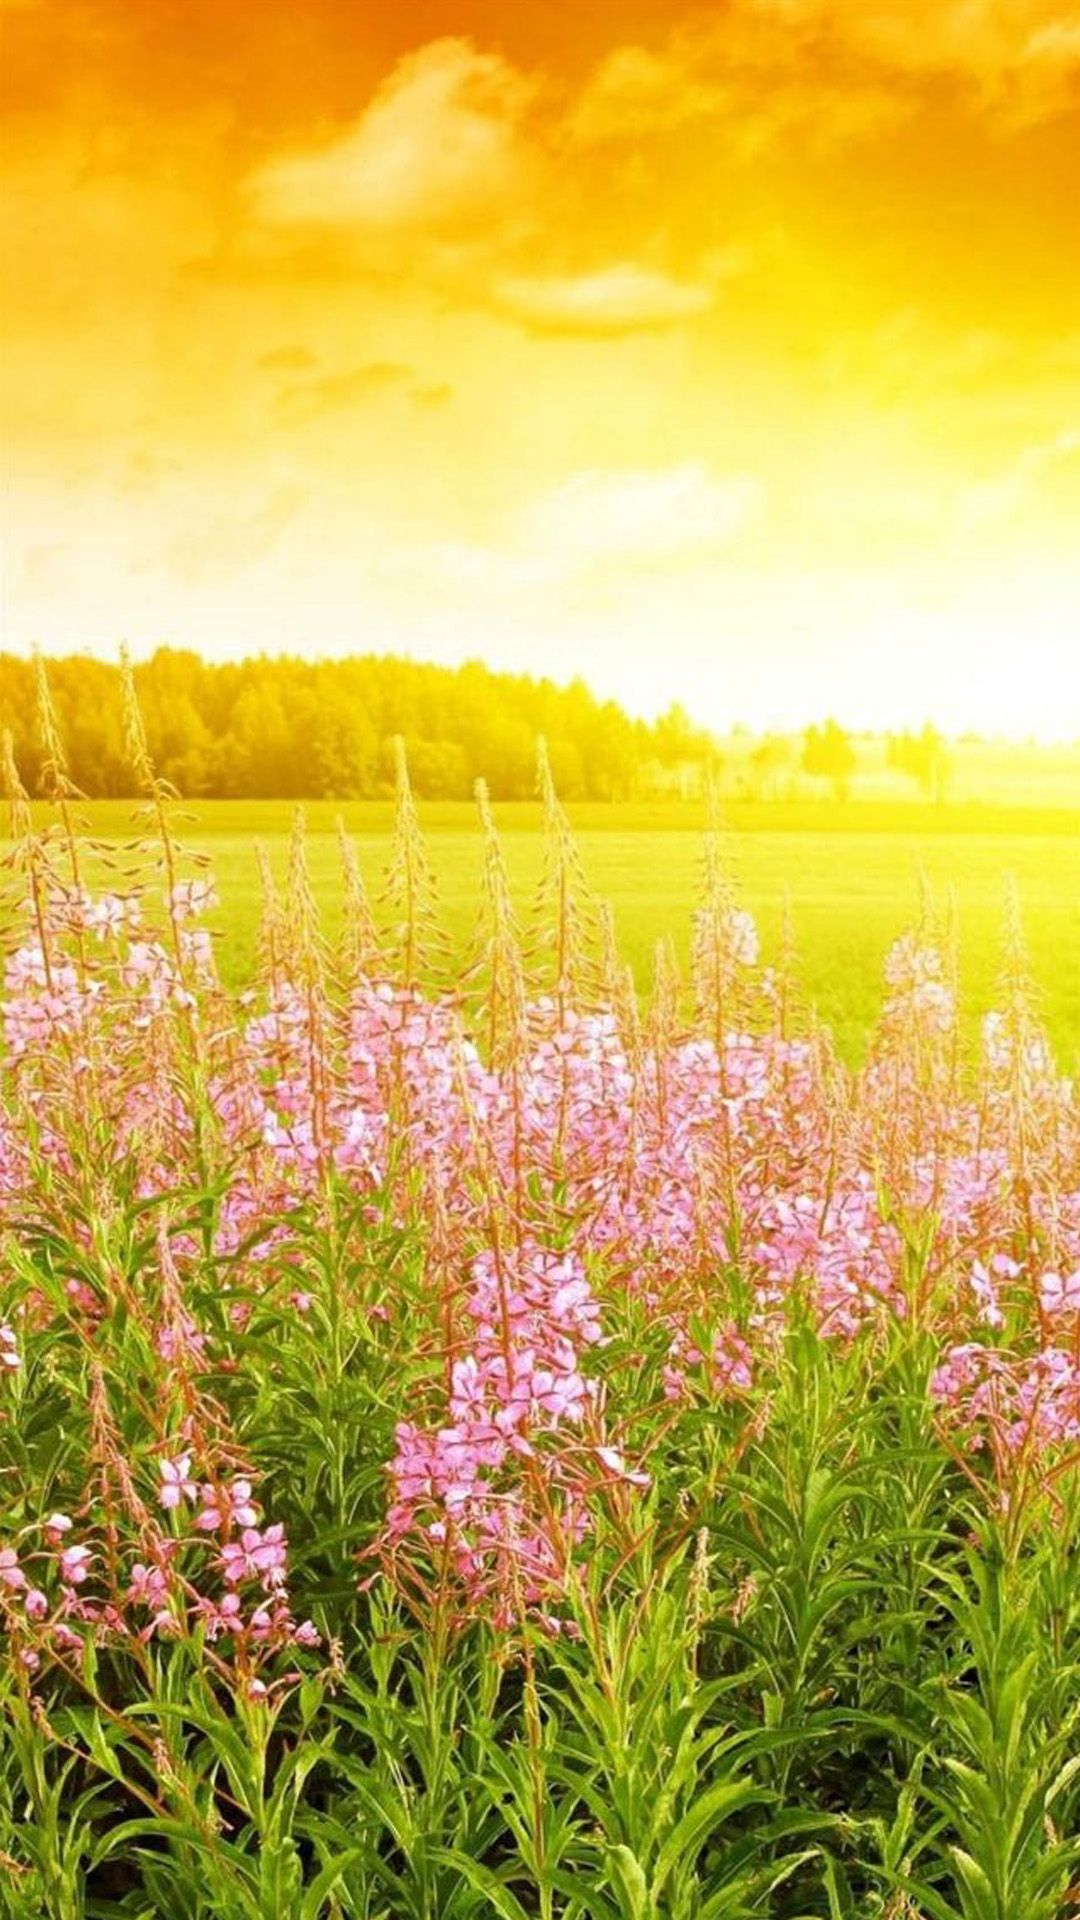 Brilliant Golden Sunshine Spring Flower Bloom Field Nature